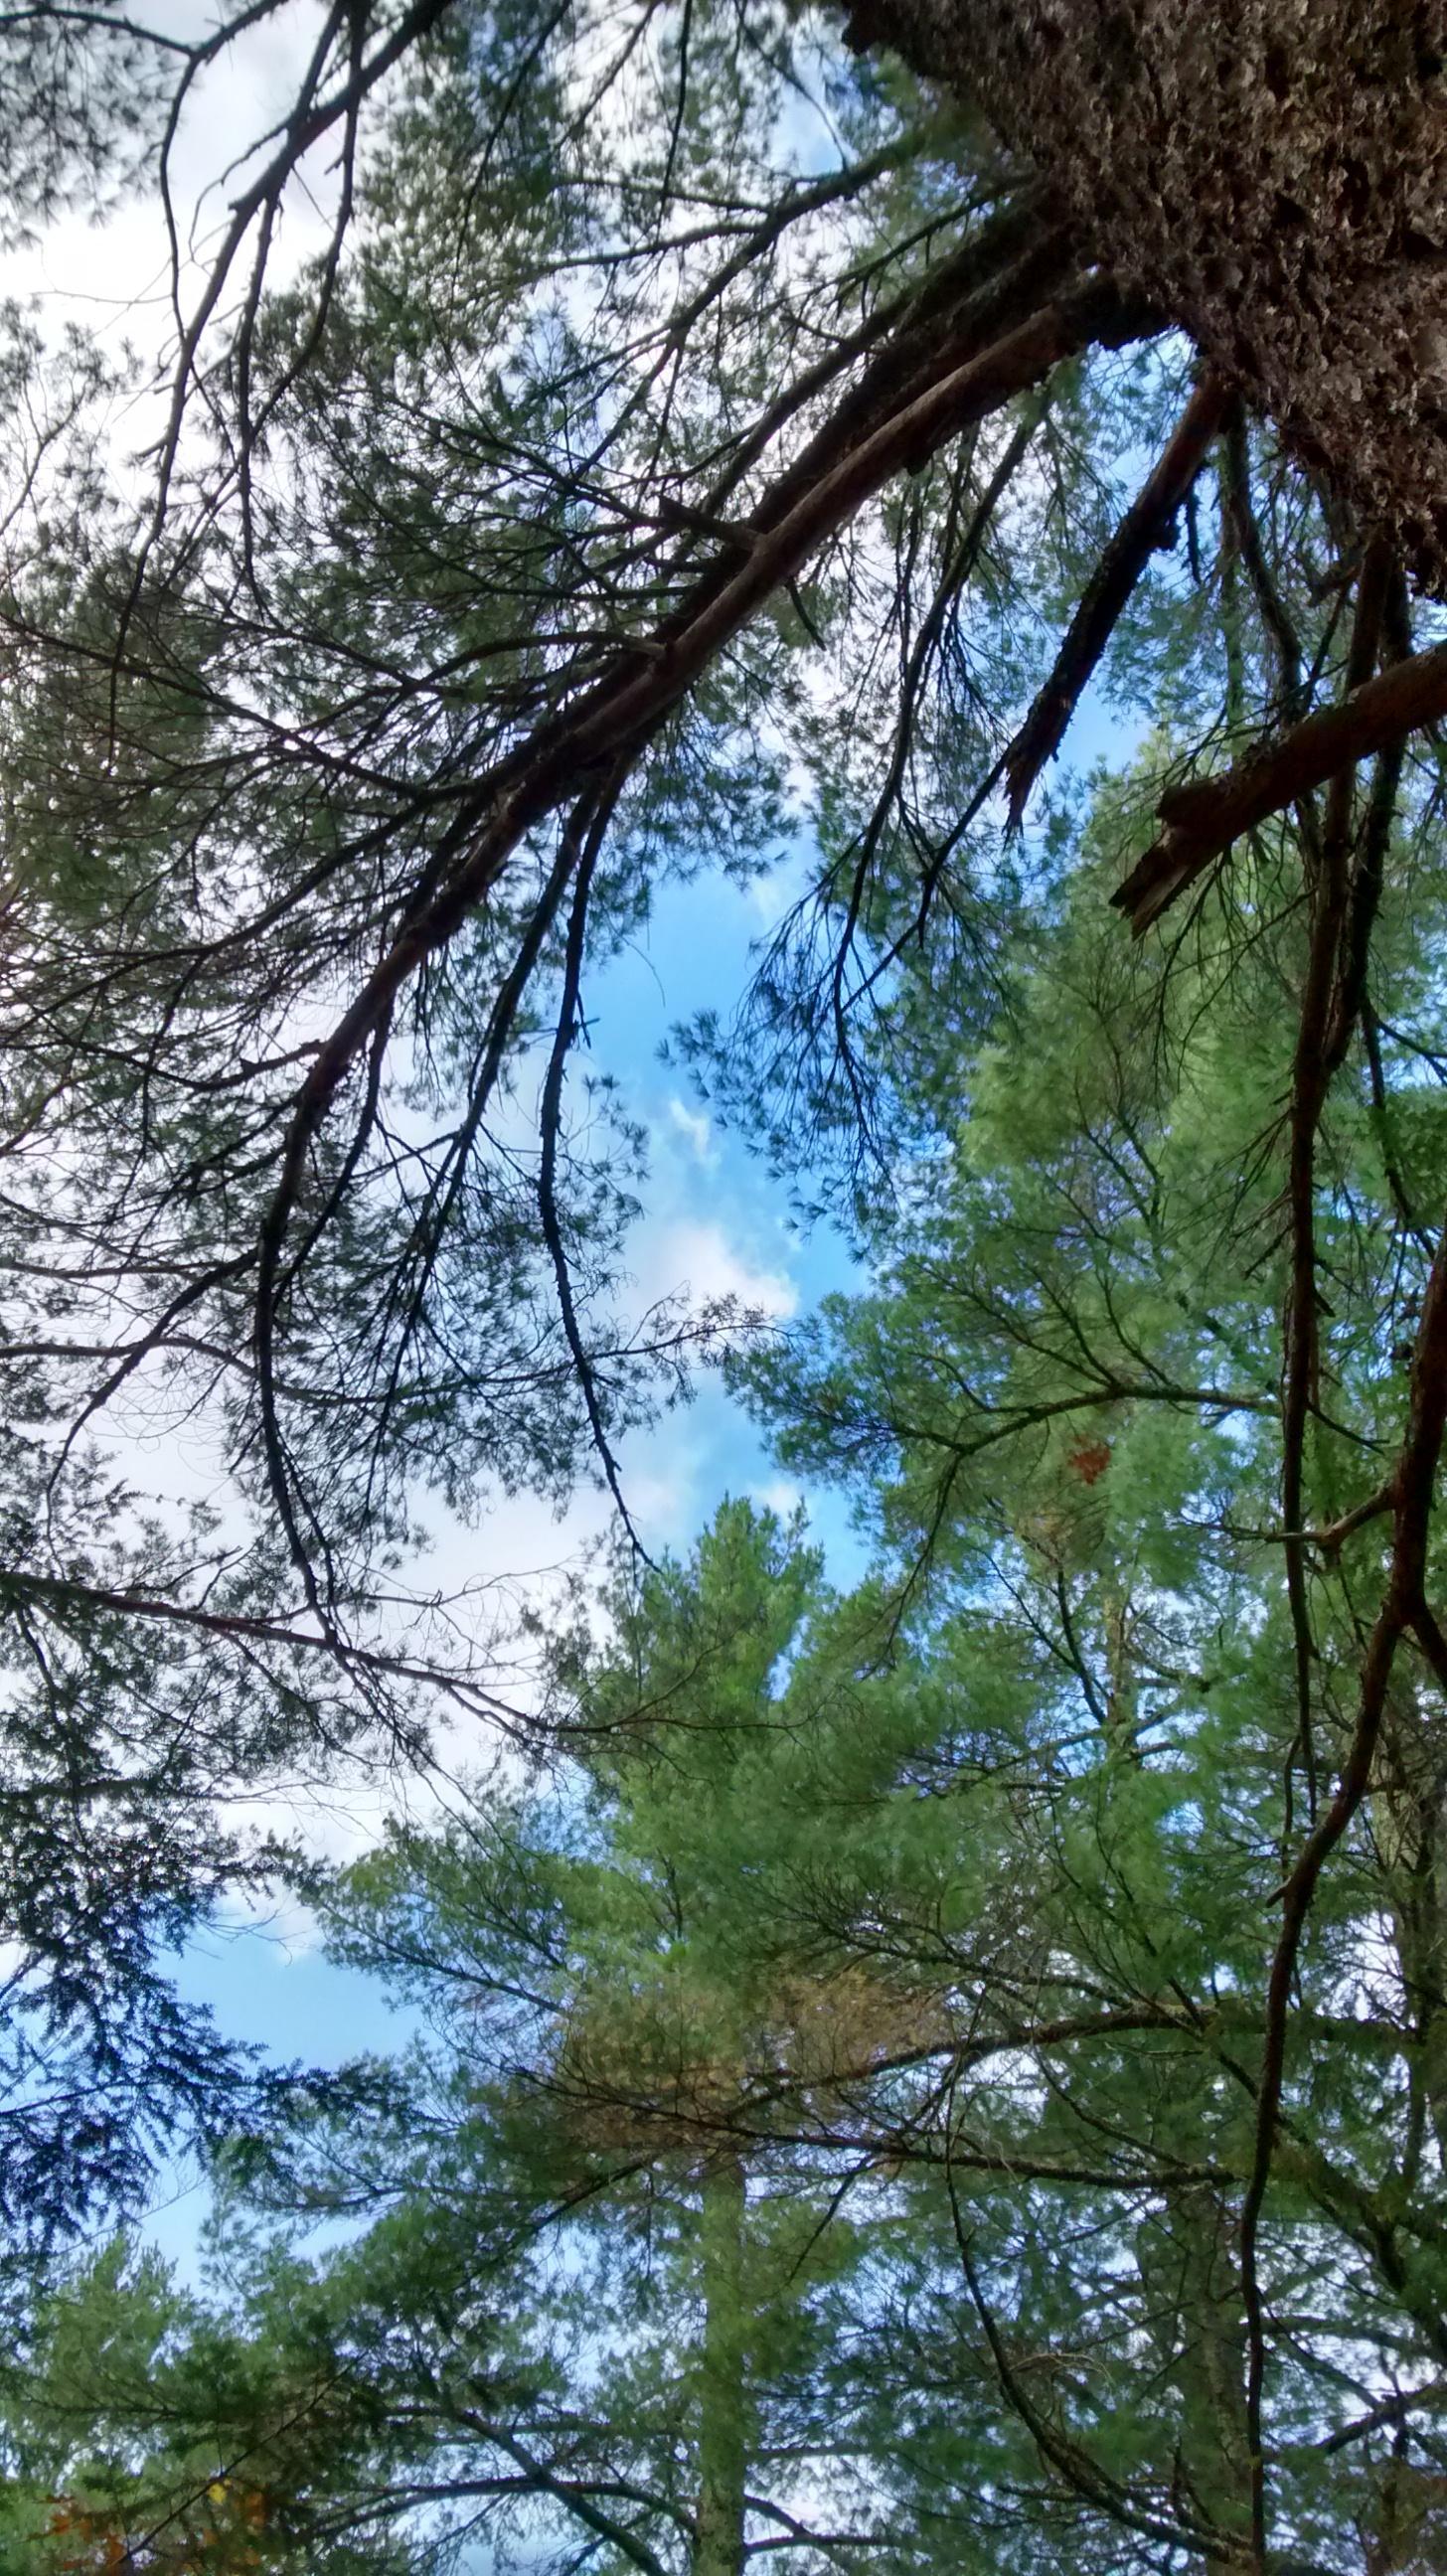 pines at Copper Falls, WI